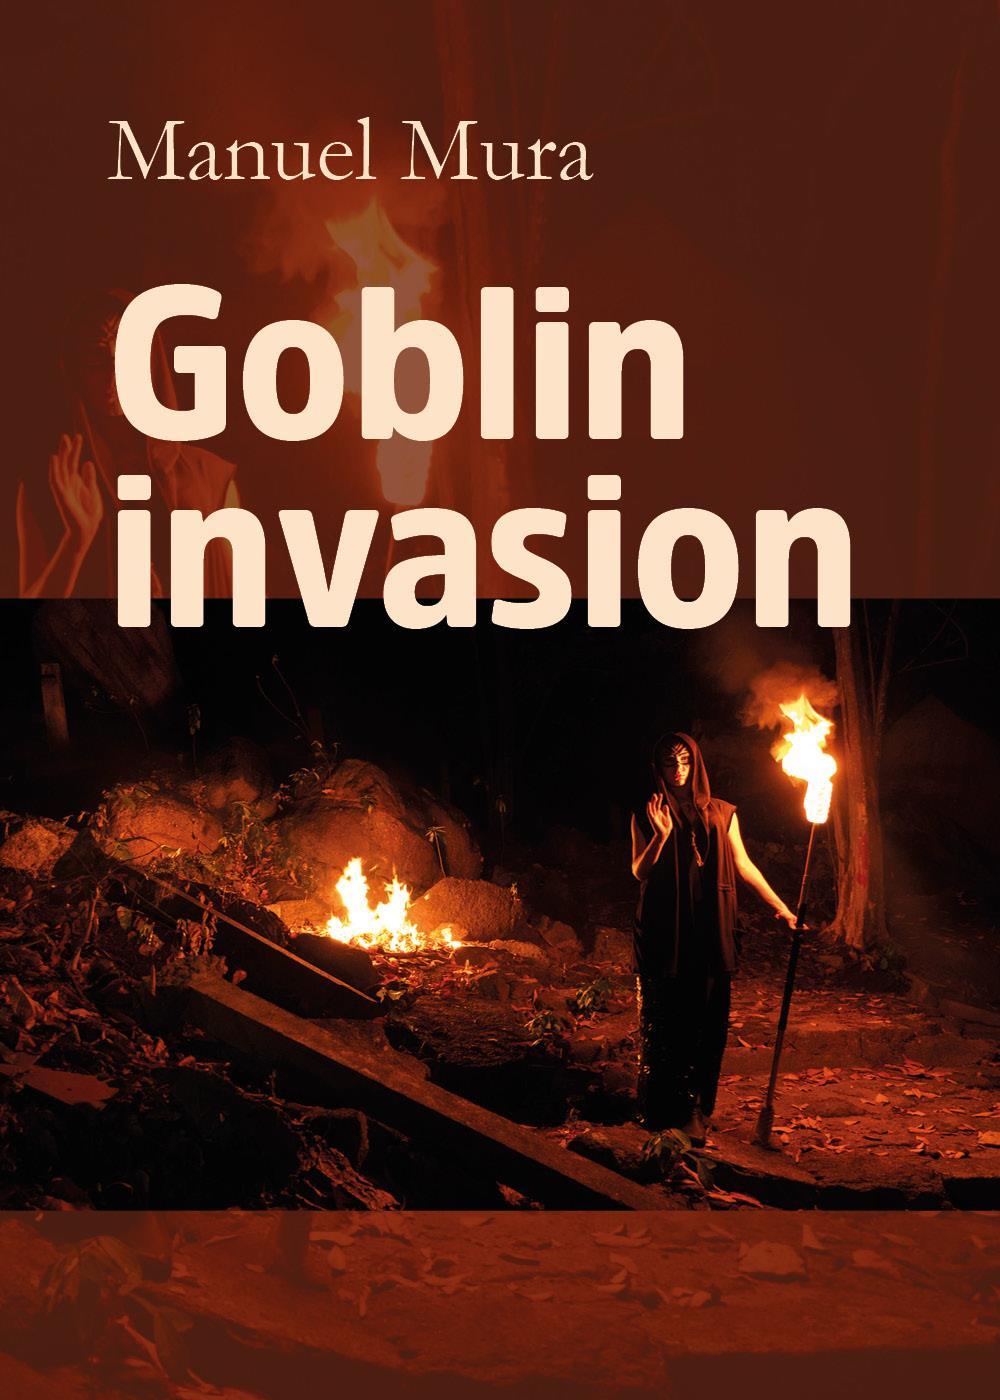 Goblin invasion